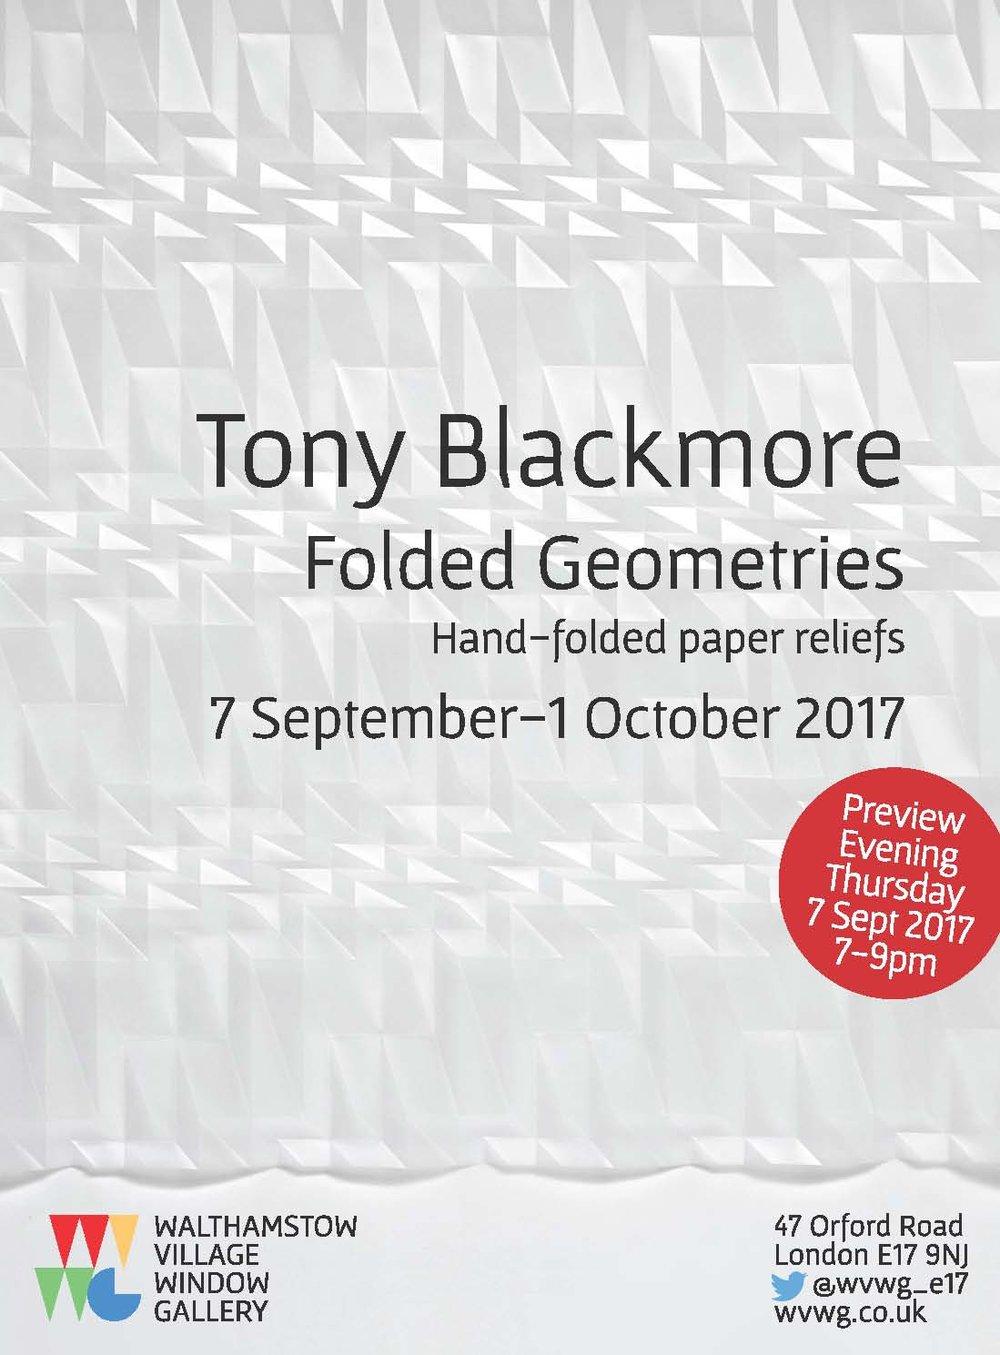 TONY-BLACKMORE-2017-WVWG_93x126mm FINAL no bleed.jpg